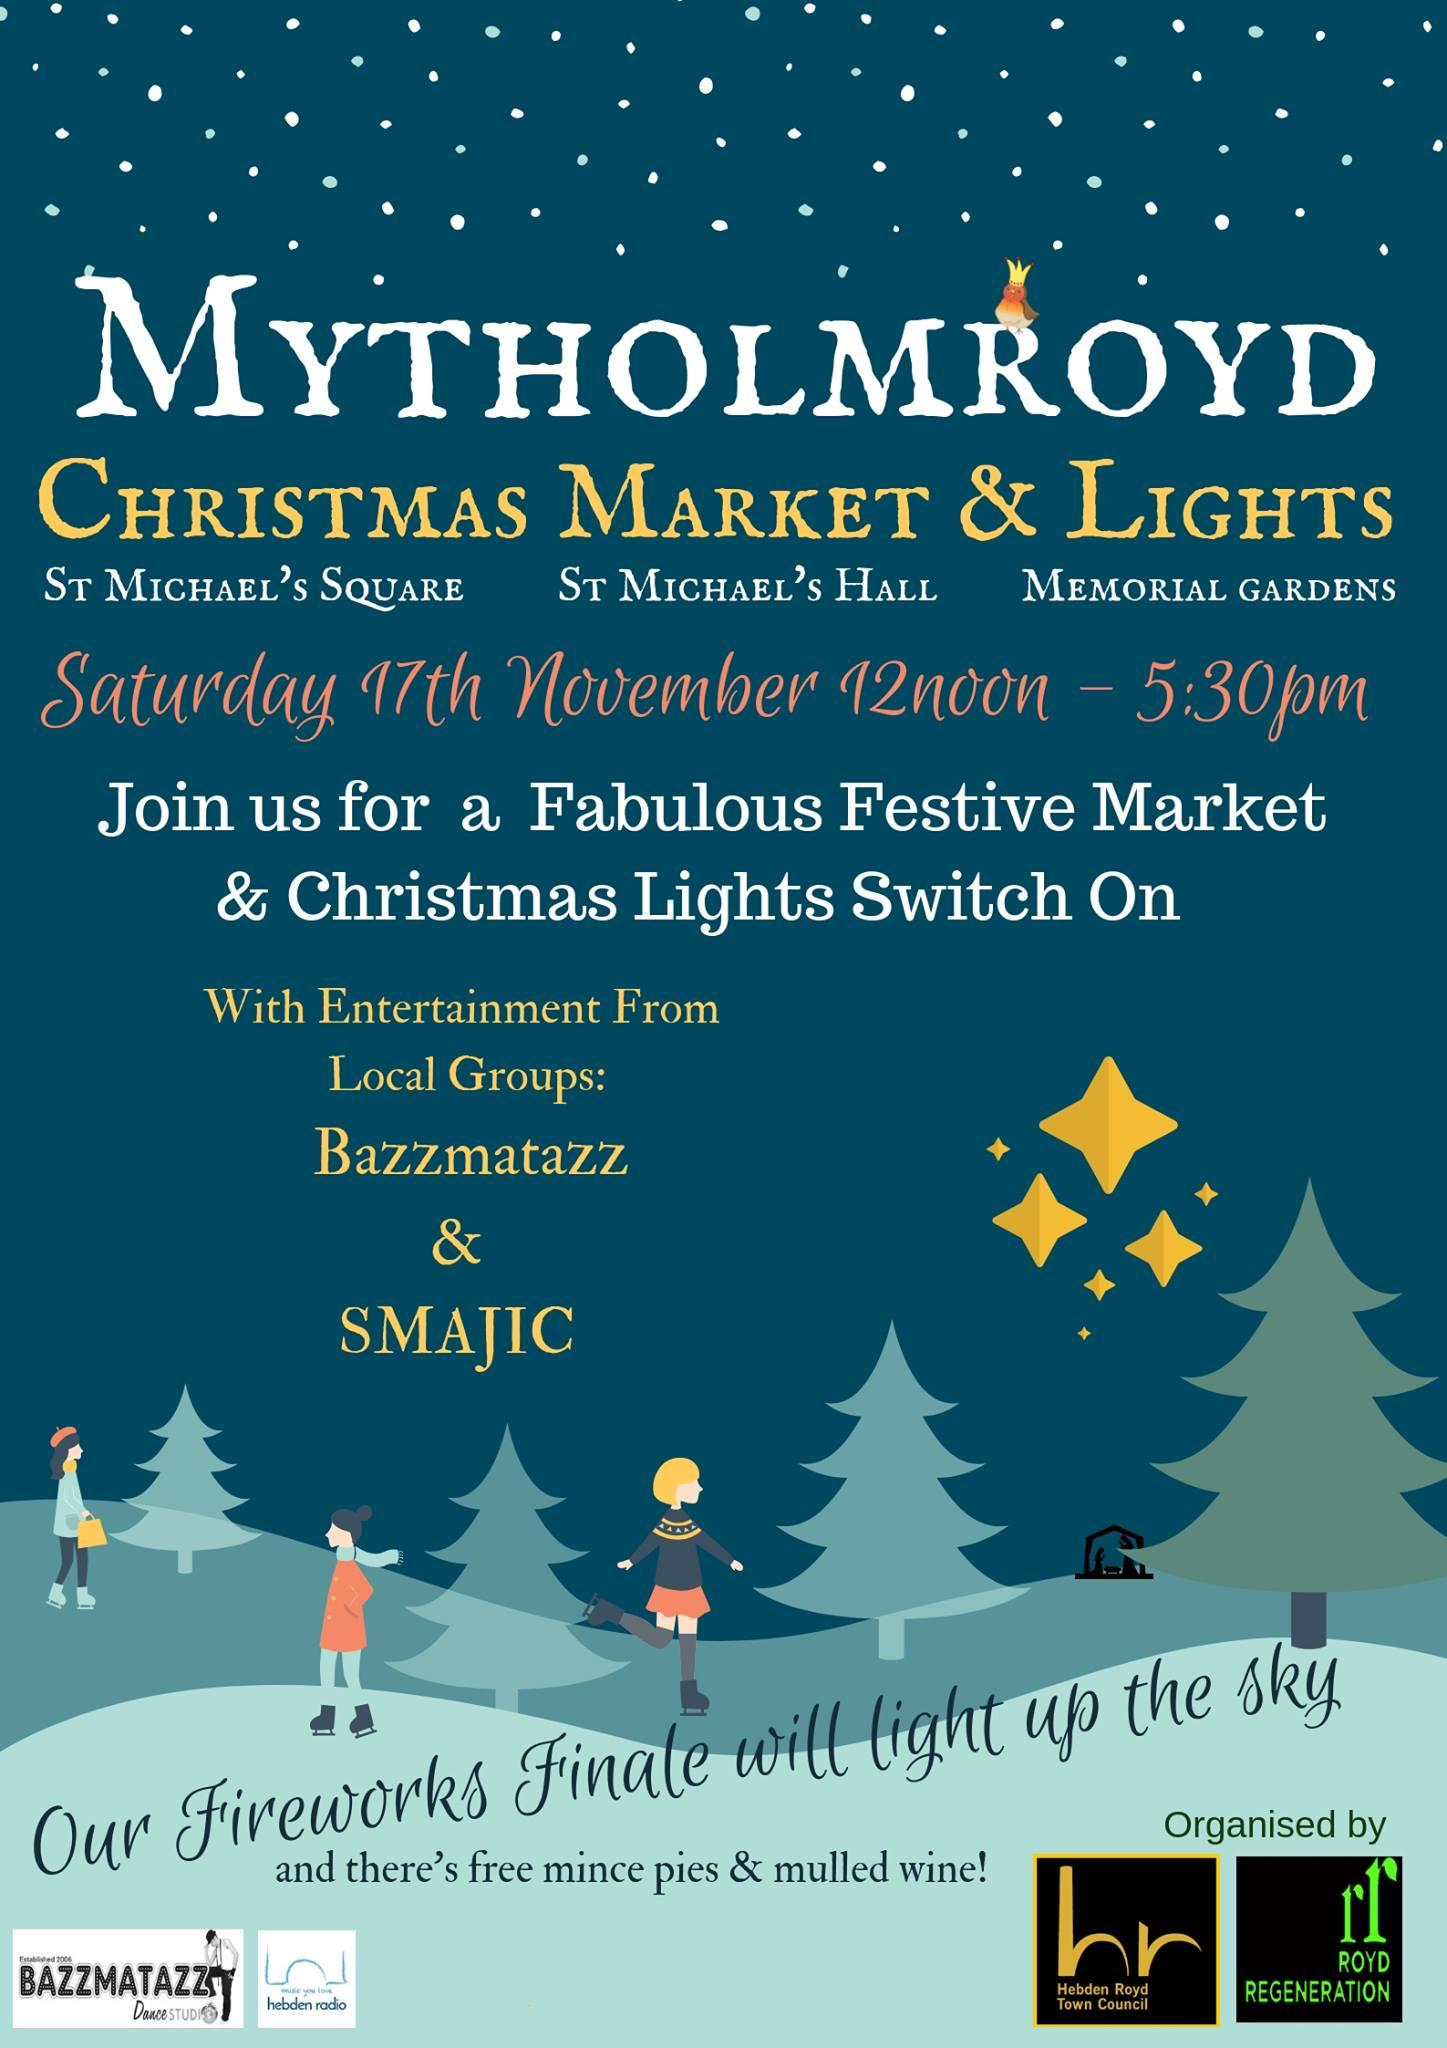 Mytholmroyd Christmas Market & Lights Switch On 2018